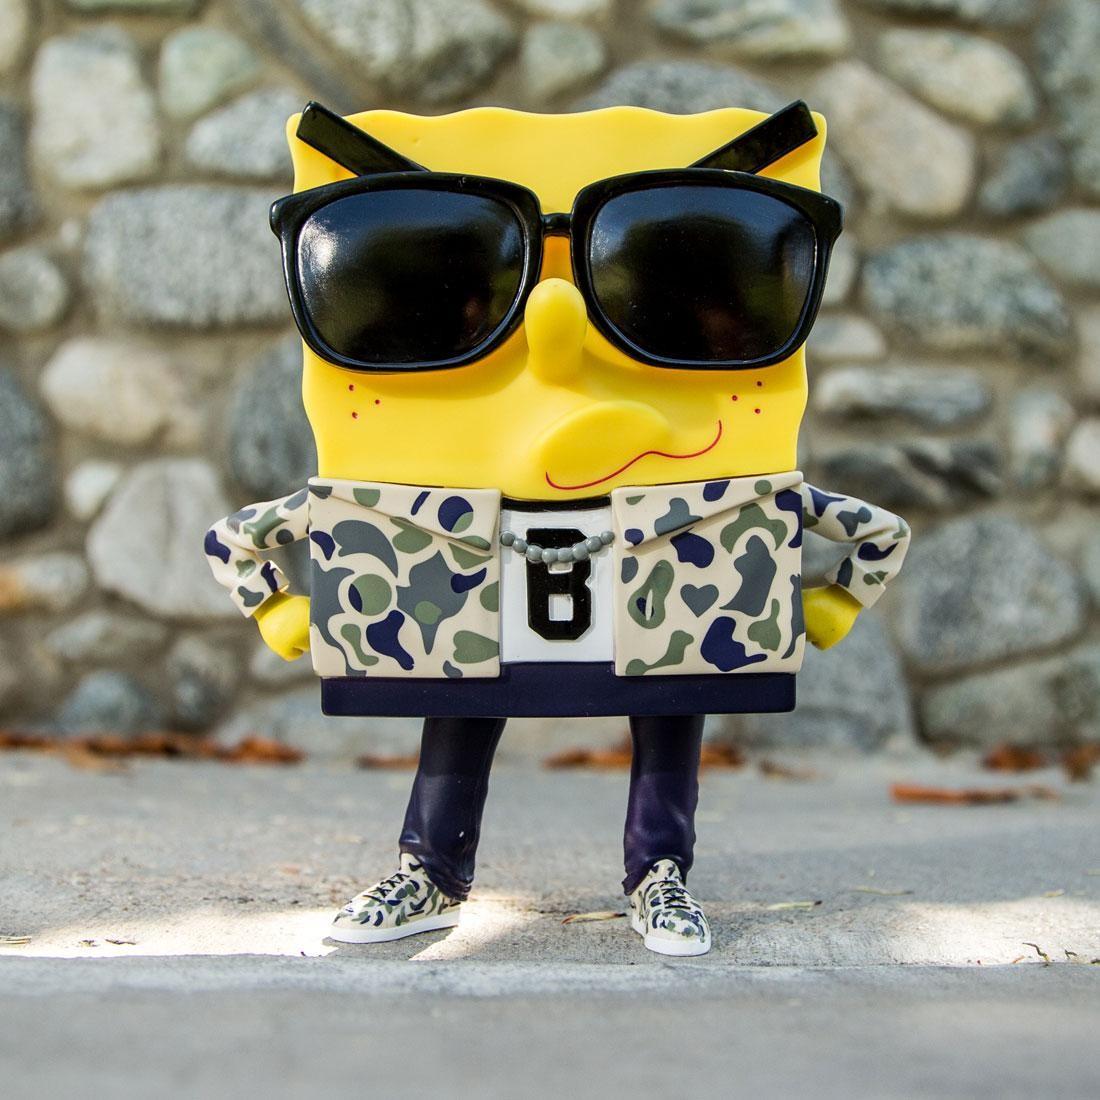 BAIT x SpongeBob SpongeBob SquarePants 8 Inch Figure (yellow)